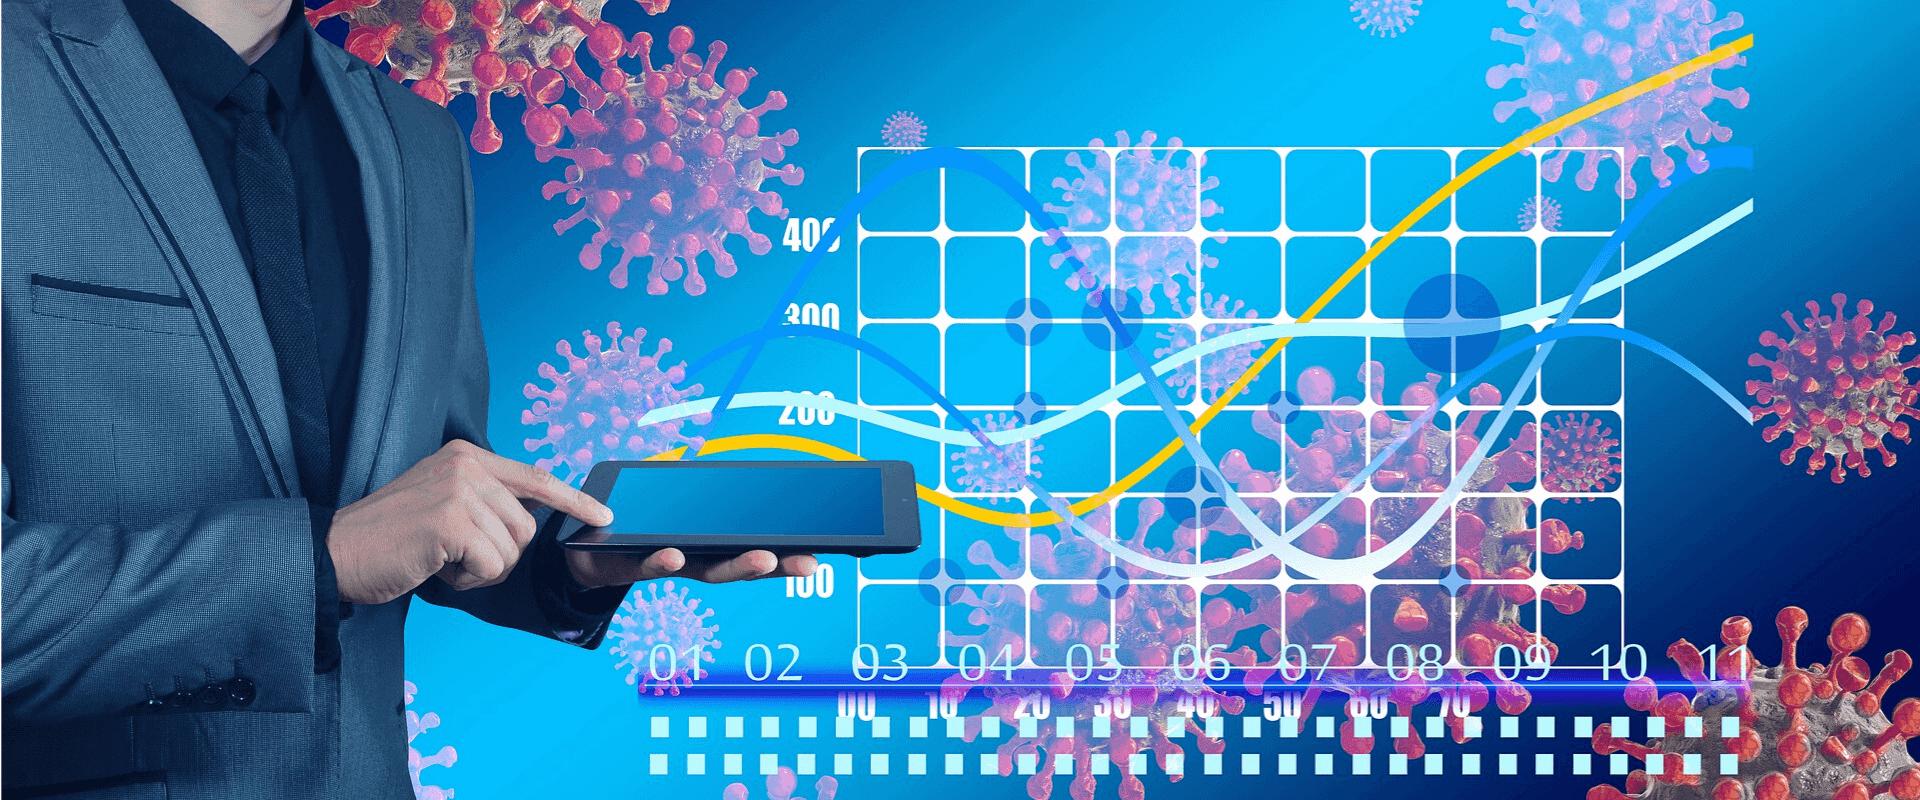 impact of corona virus on real estate